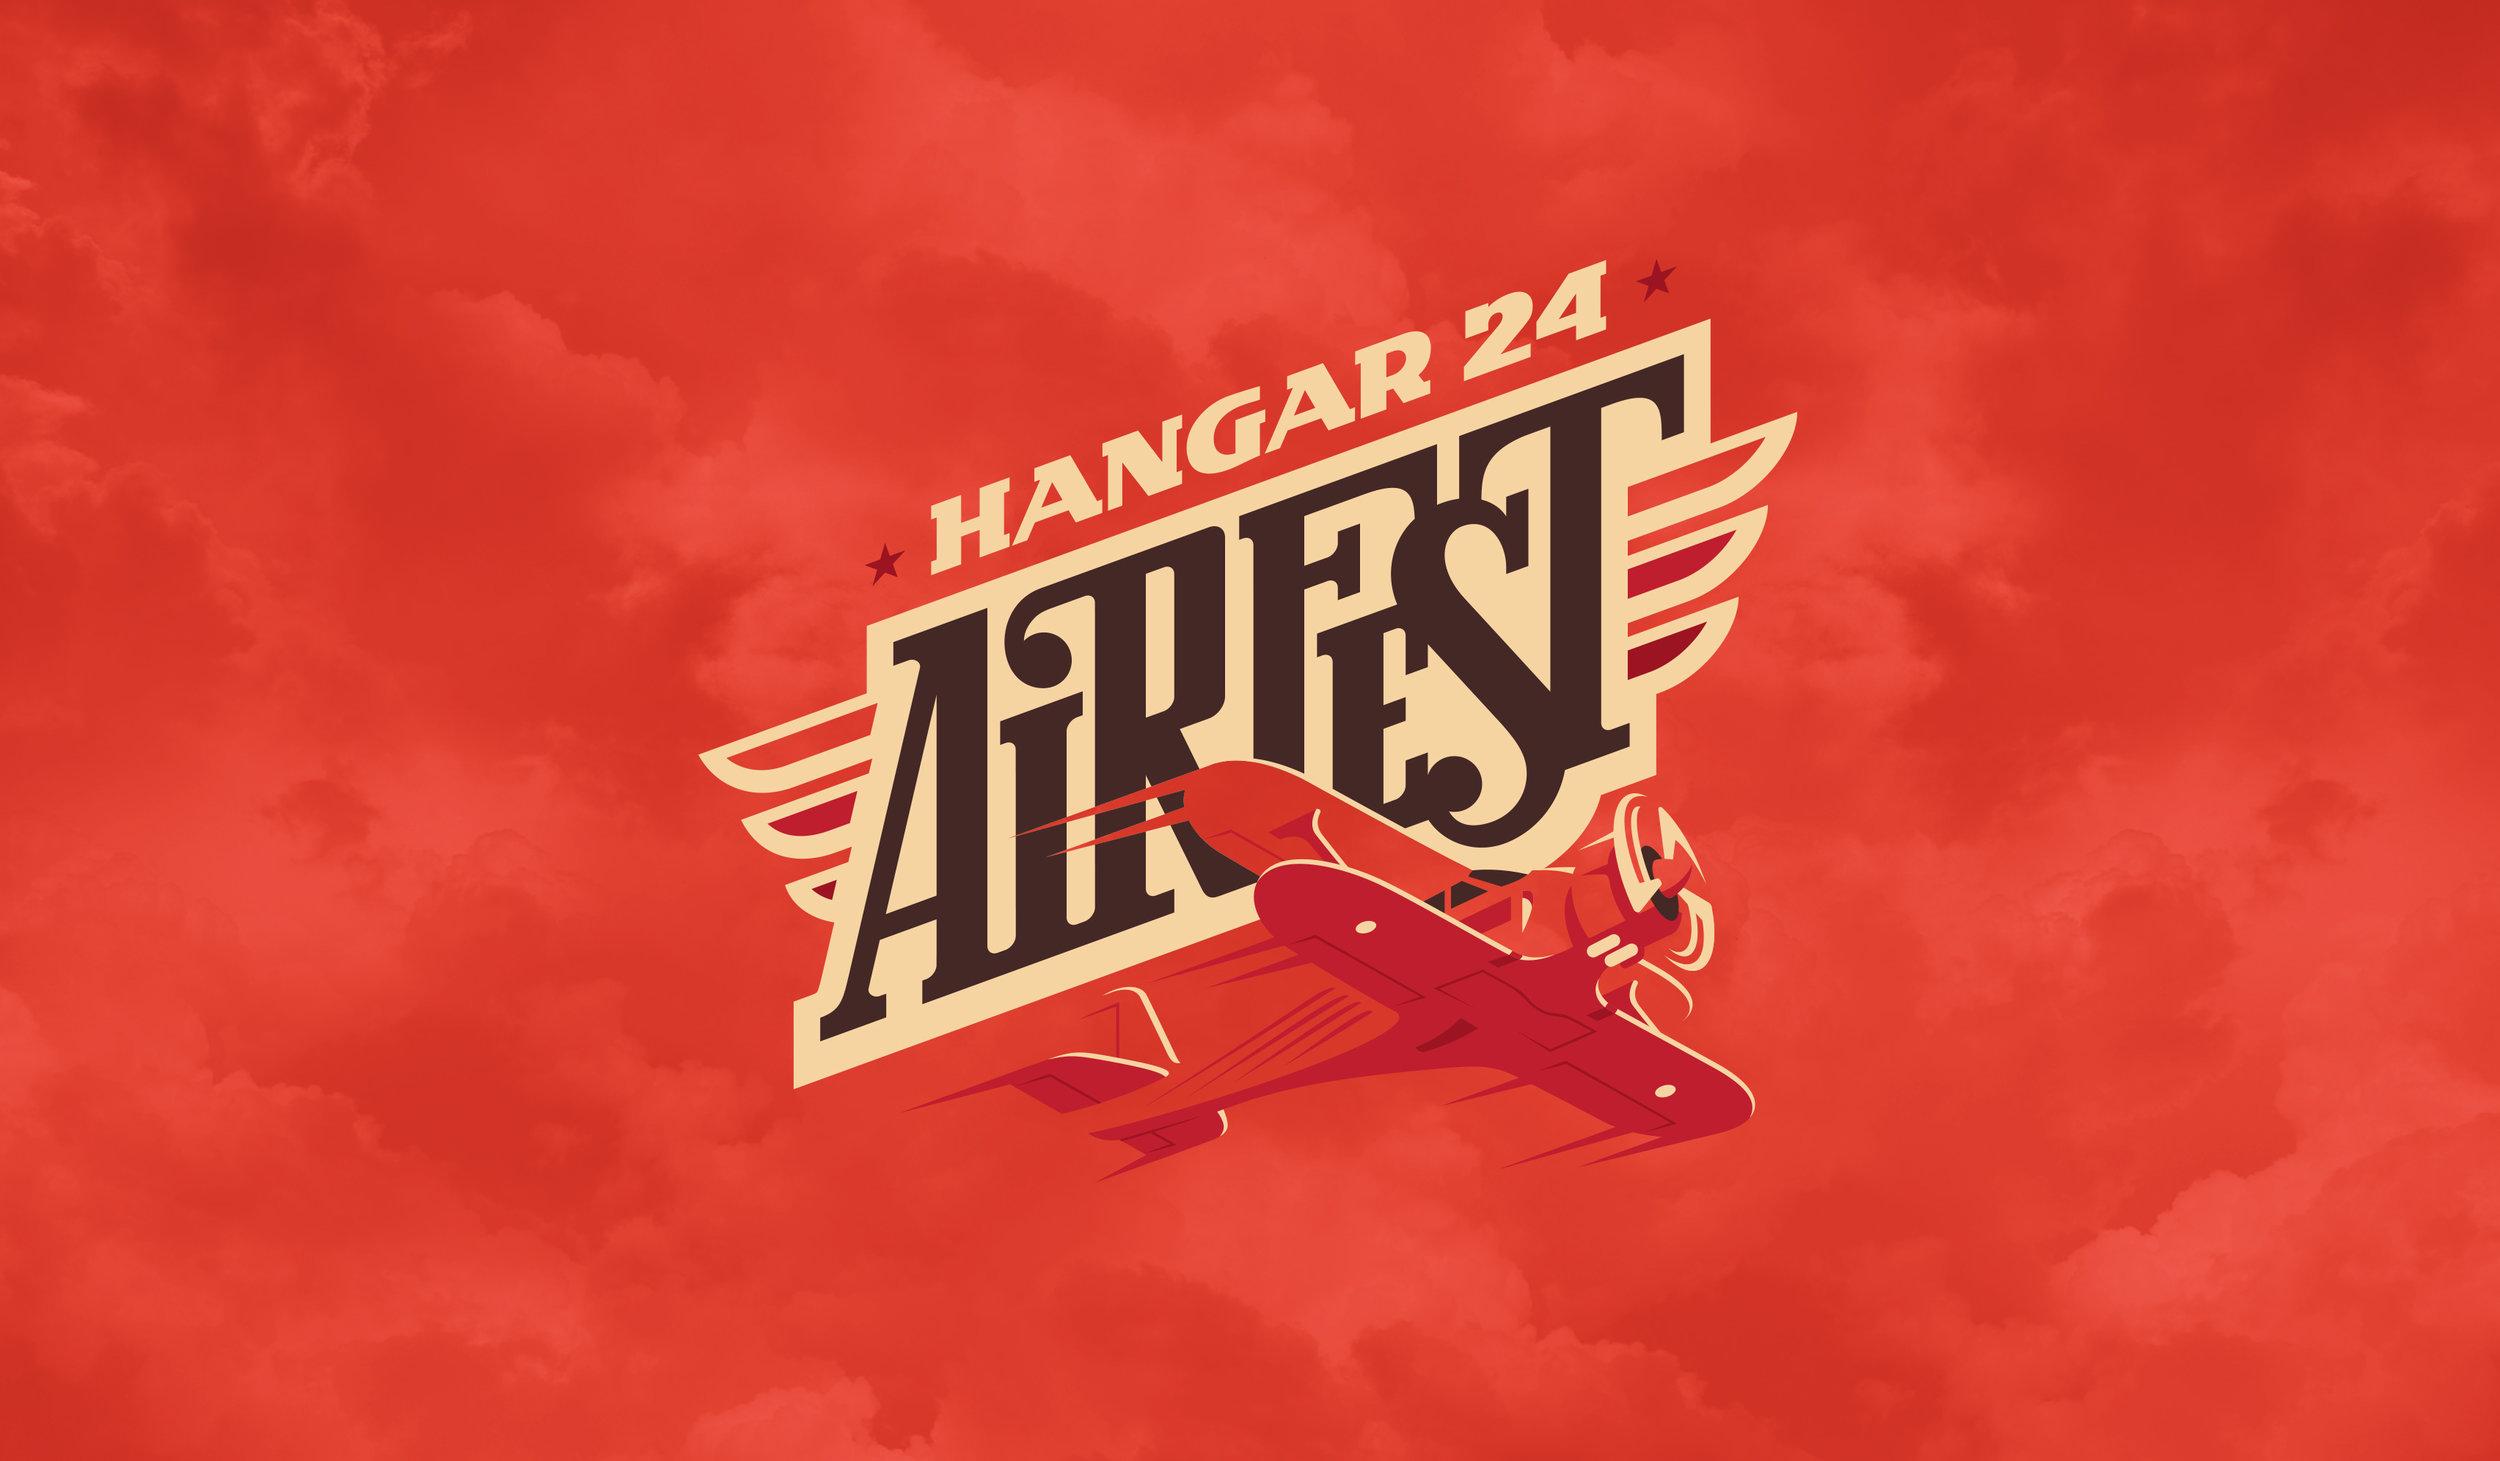 airfest_h24_logo.jpg